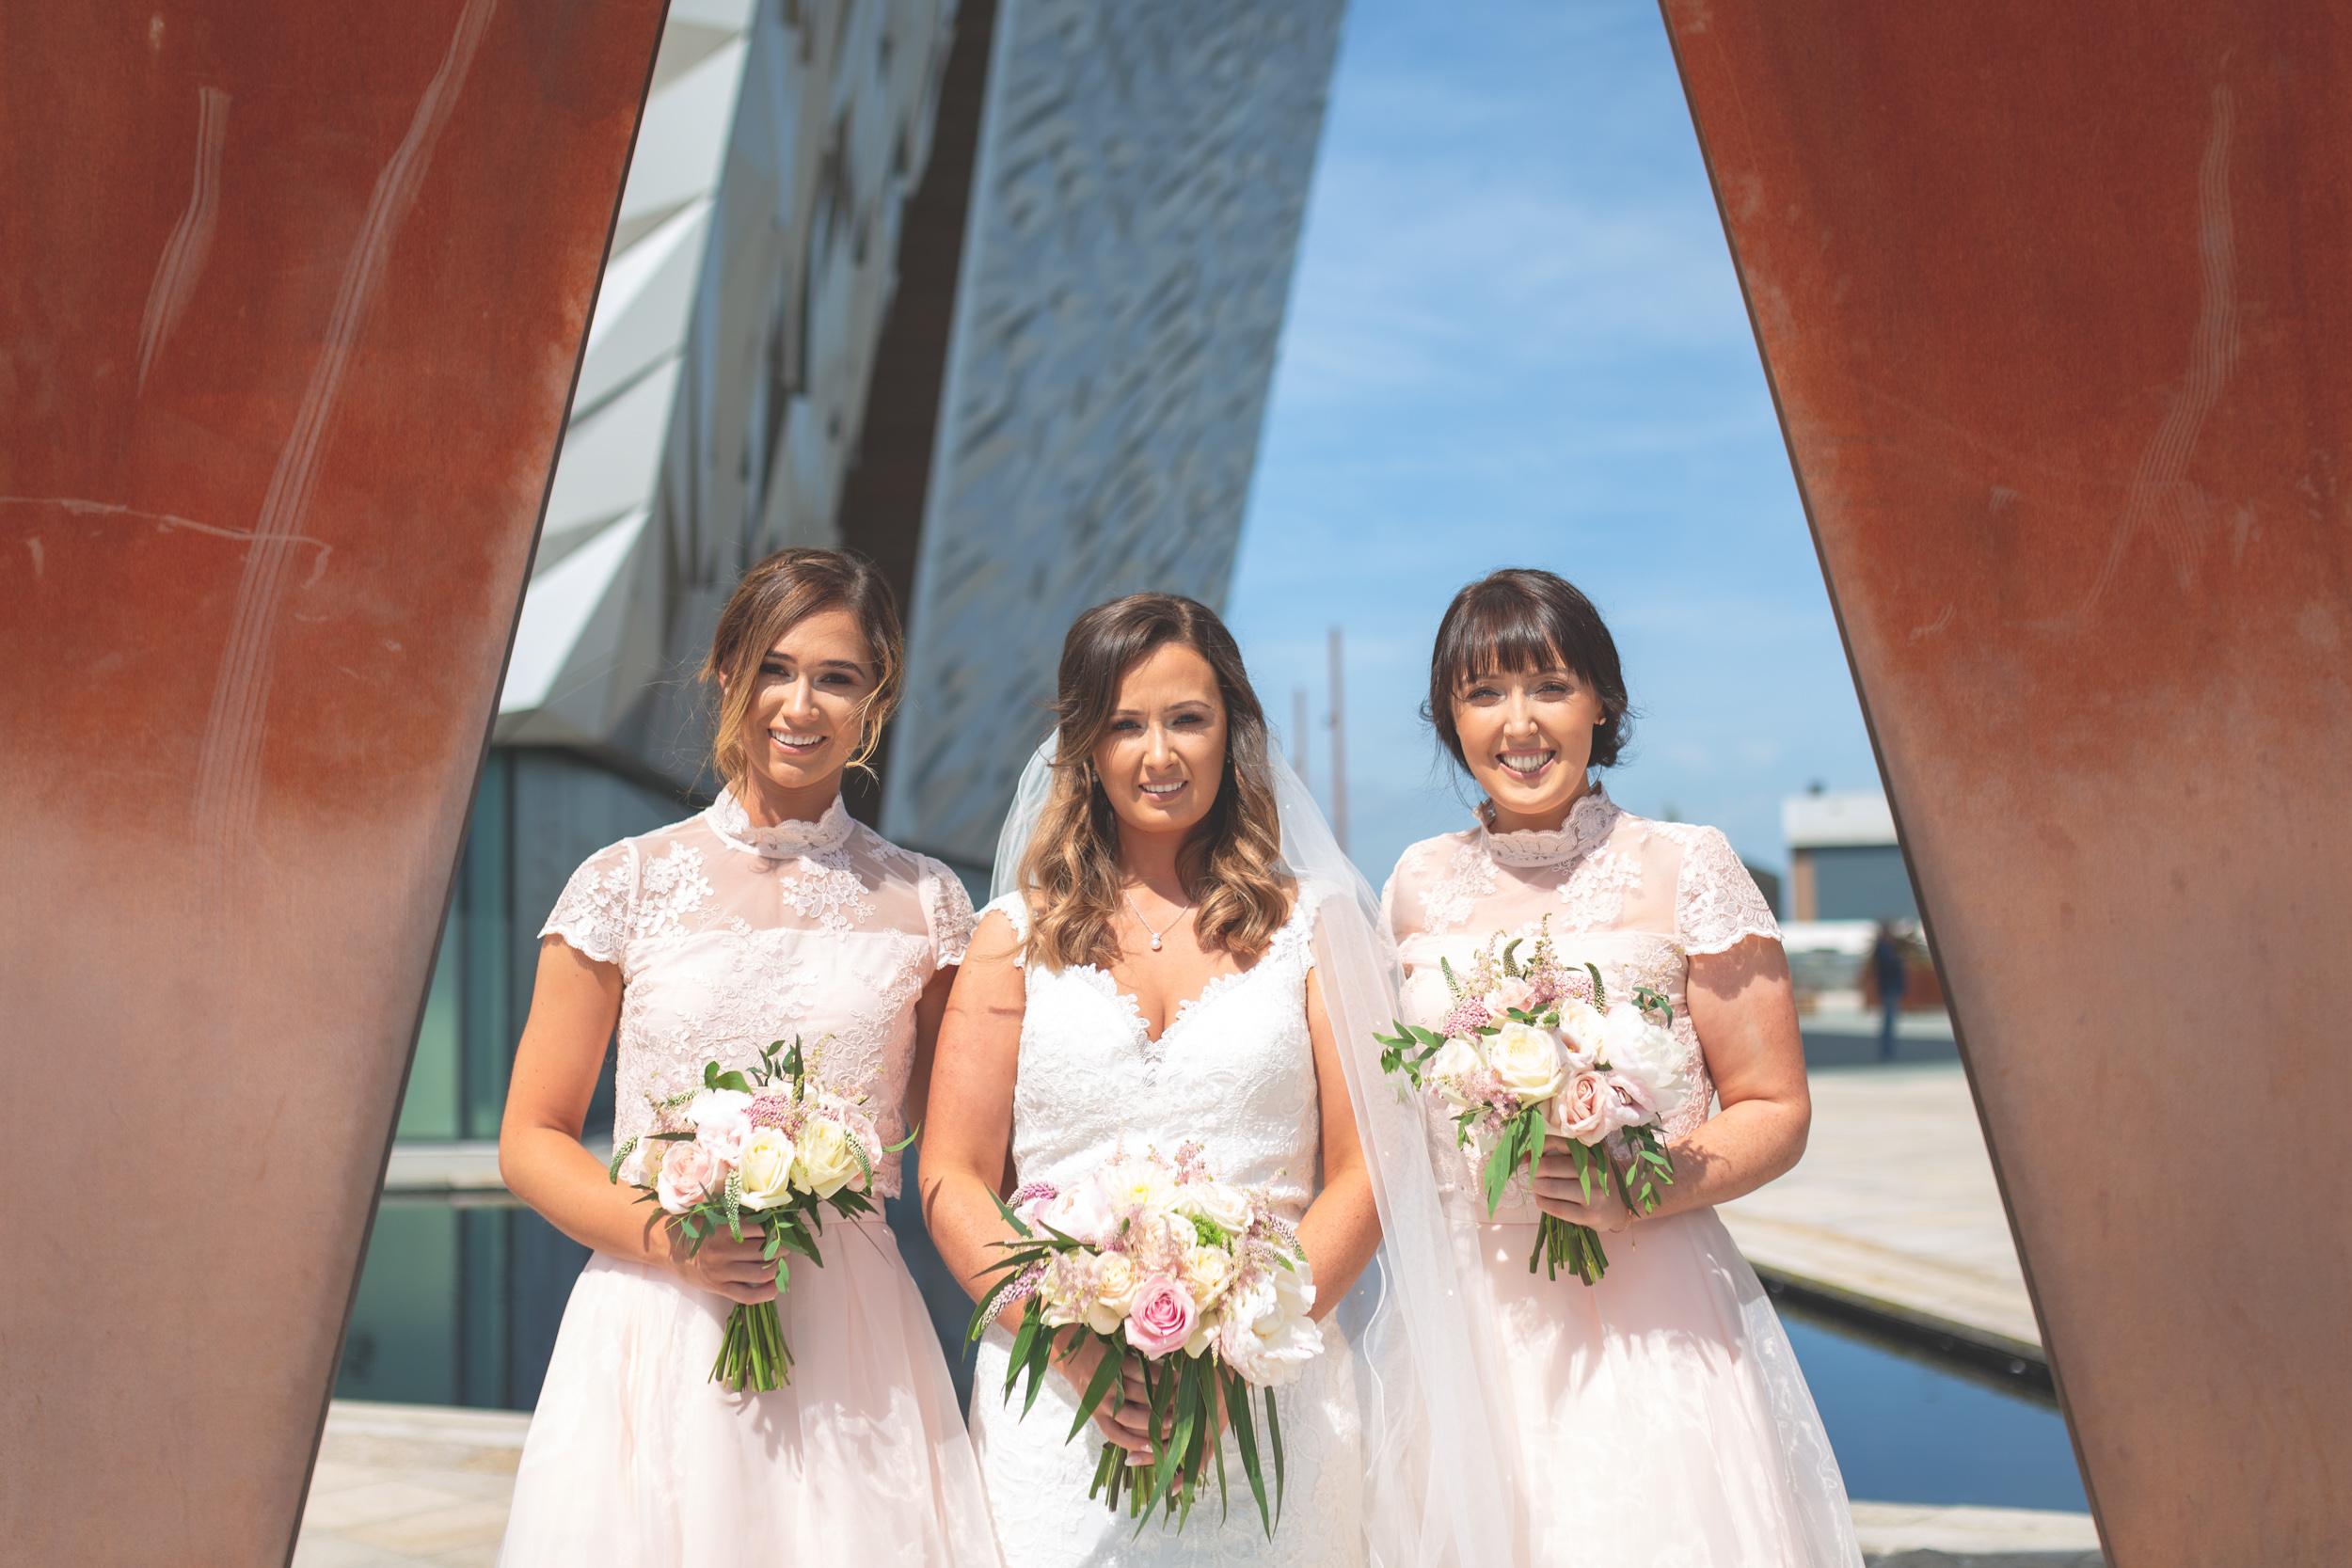 Brian McEwan   Northern Ireland Wedding Photographer   Rebecca & Michael   Portraits-62.jpg